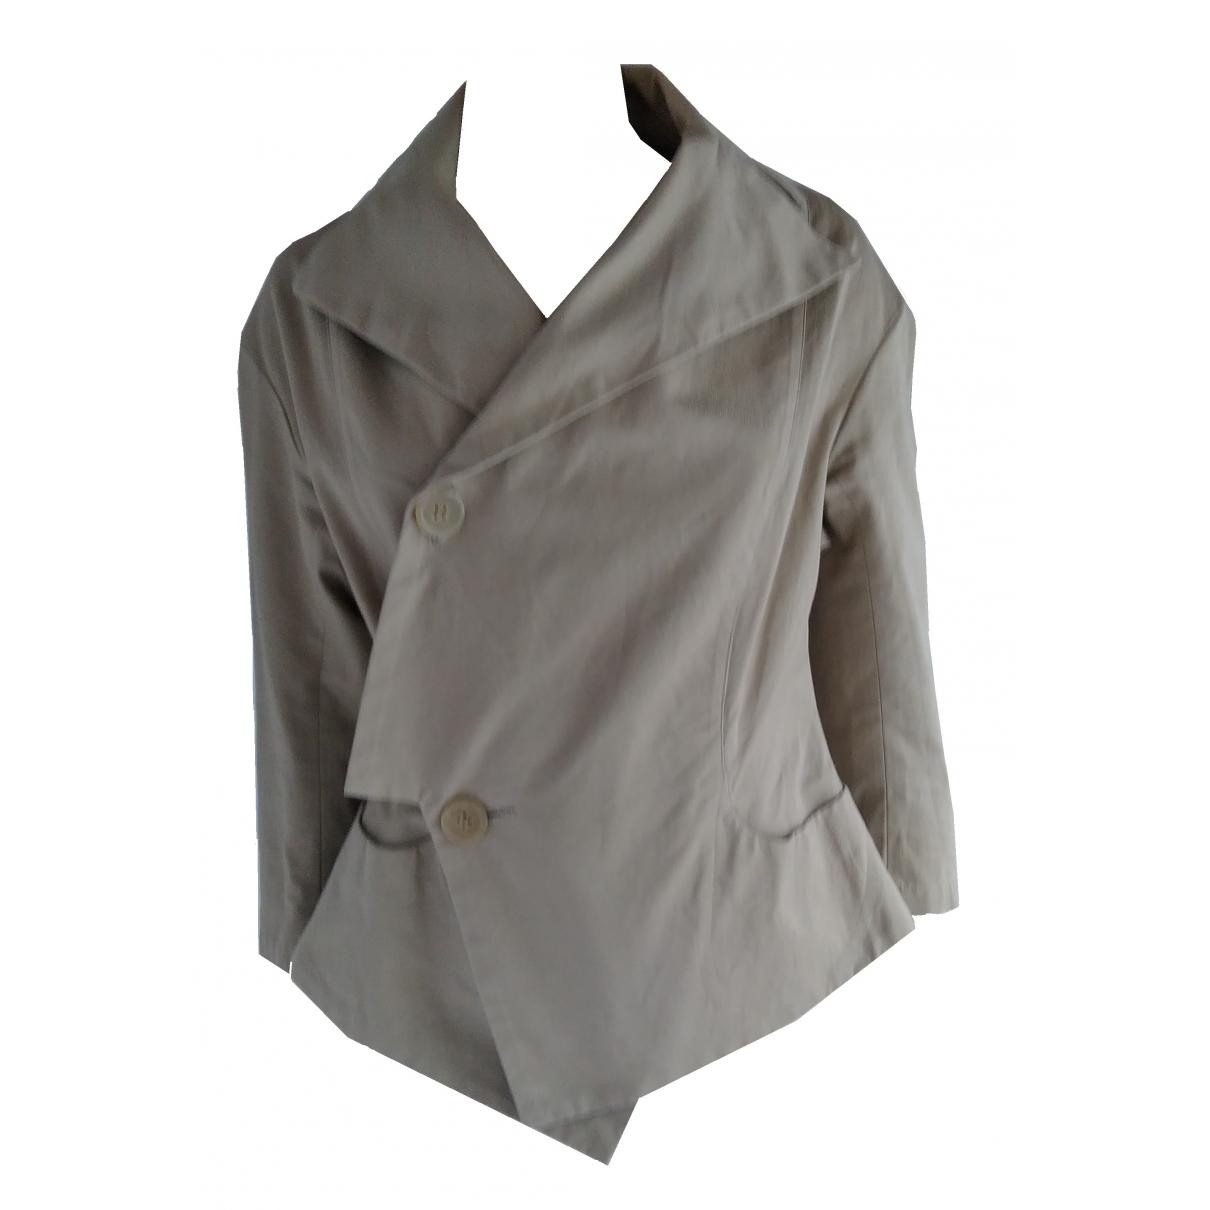 Yohji Yamamoto \N Beige Cotton jacket for Women S International